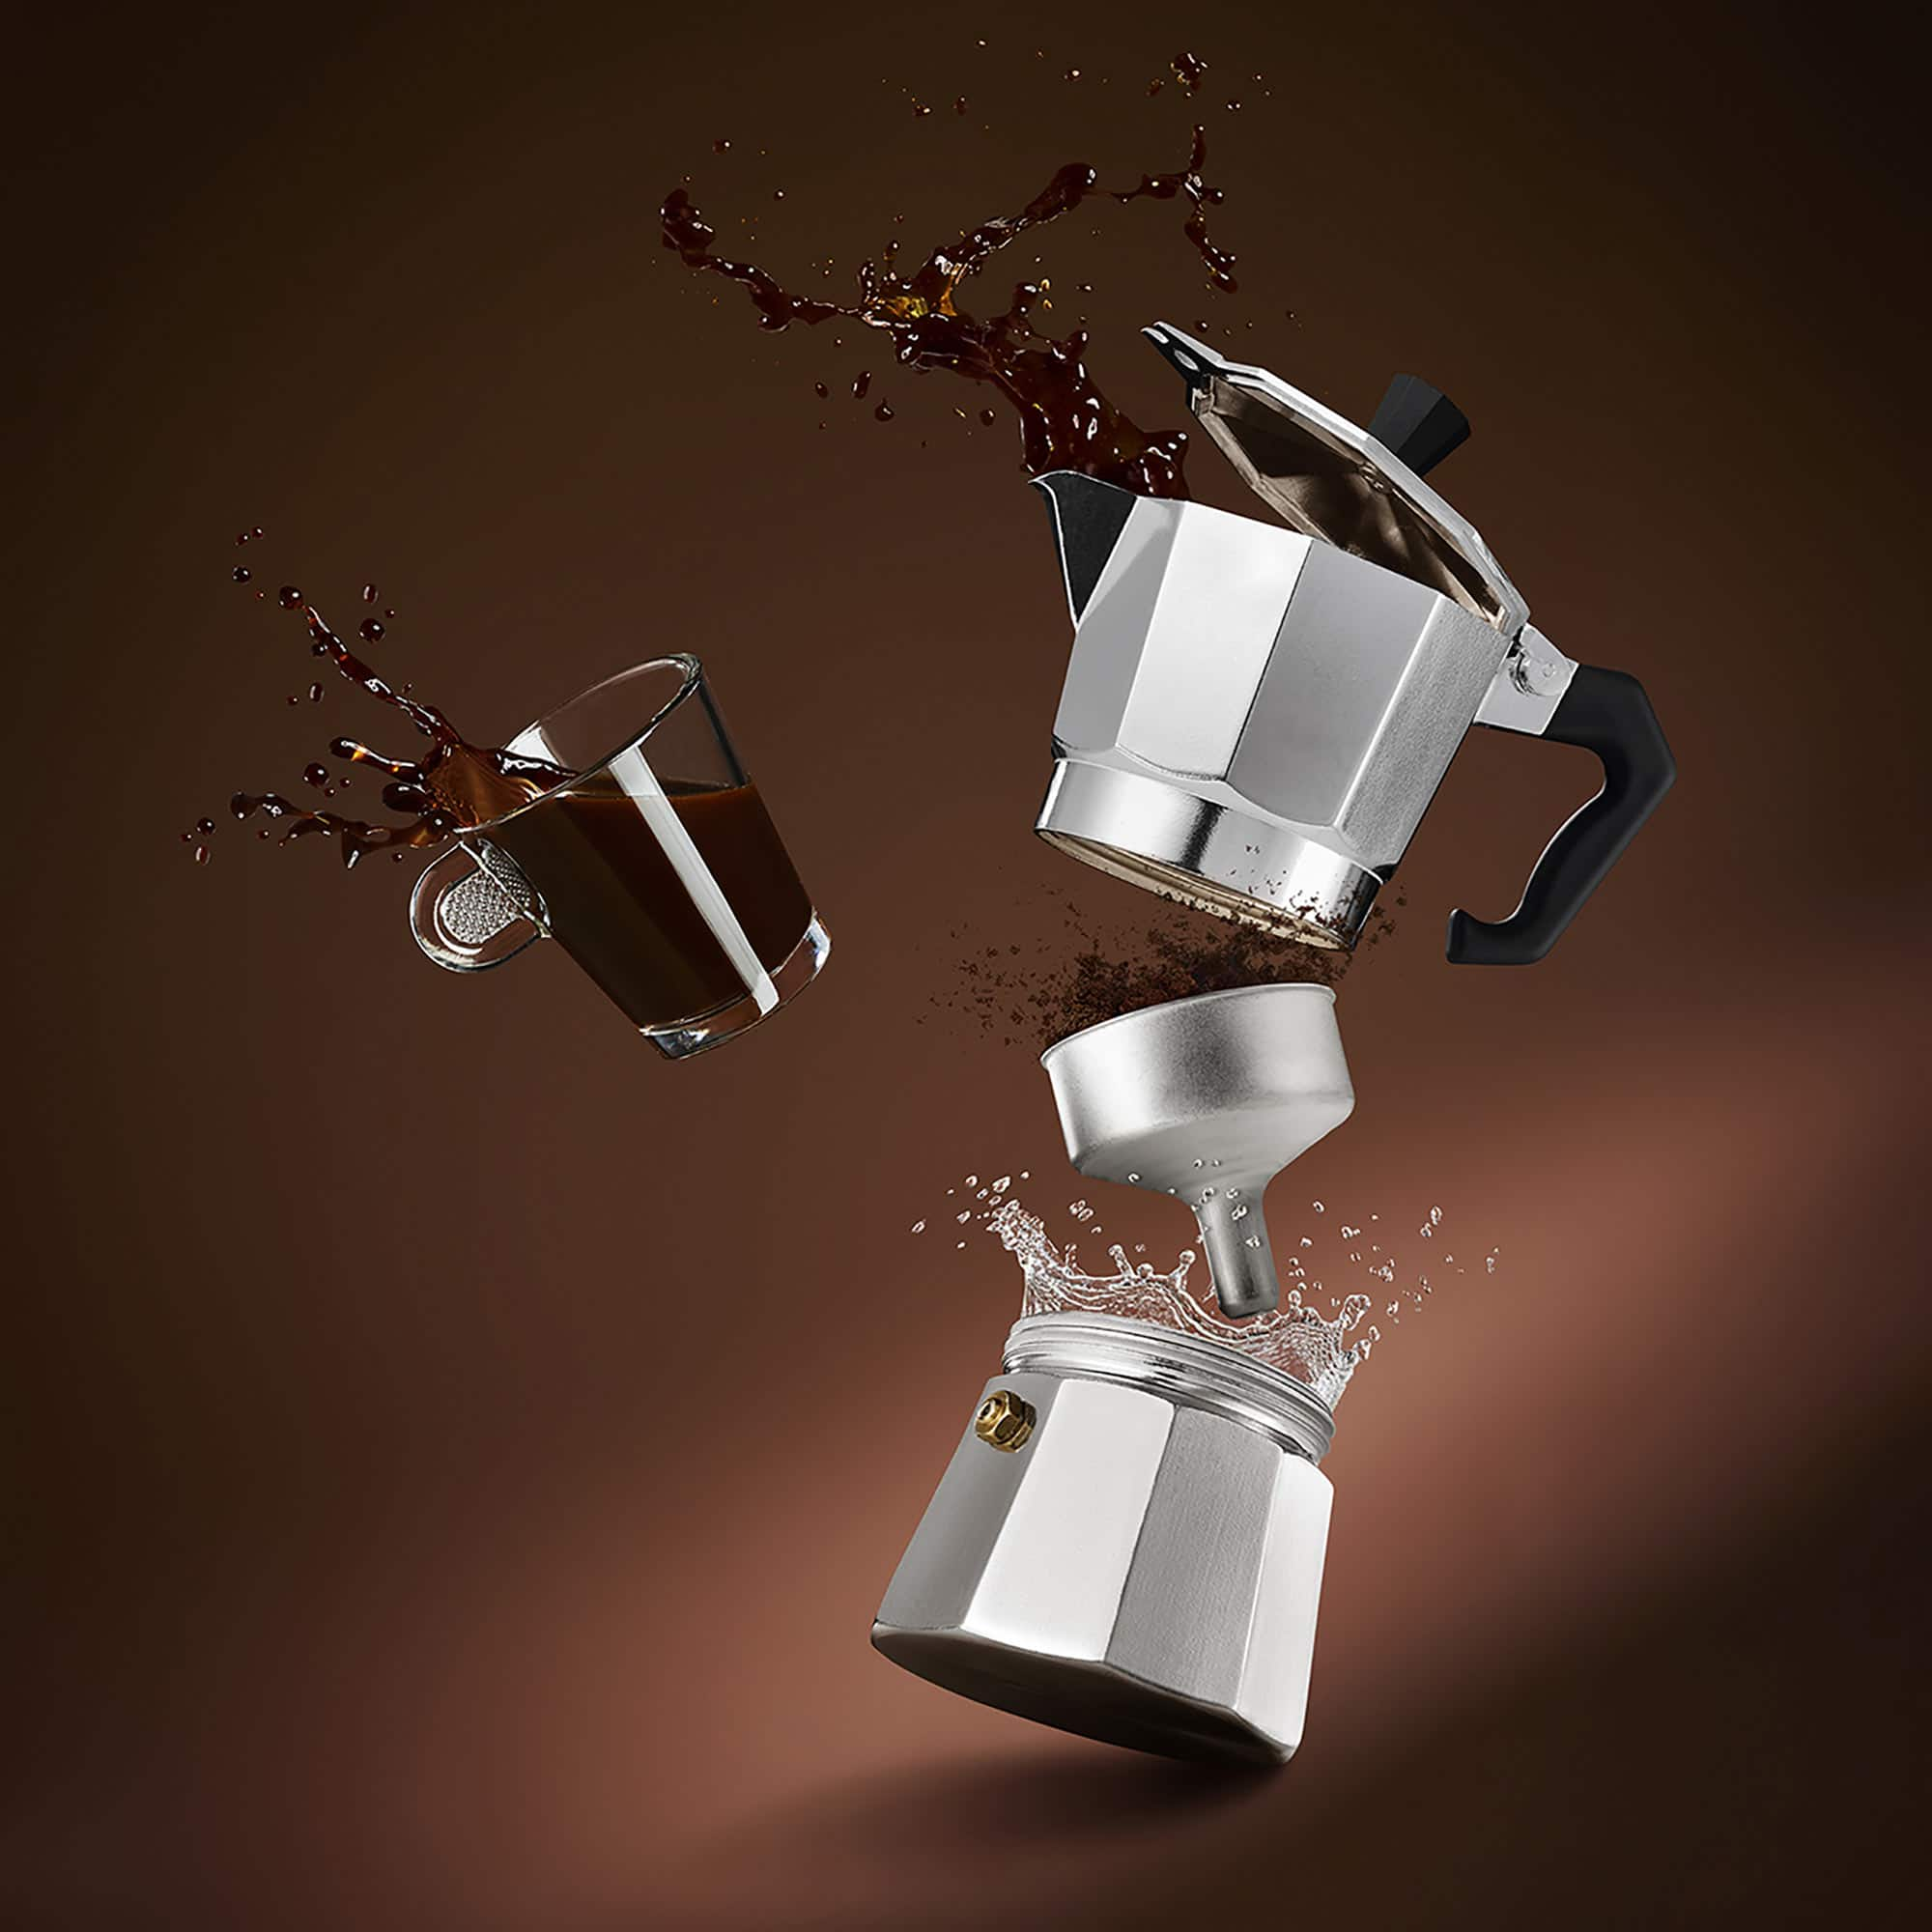 Coffee Moka Still Life Shot by Fotografando